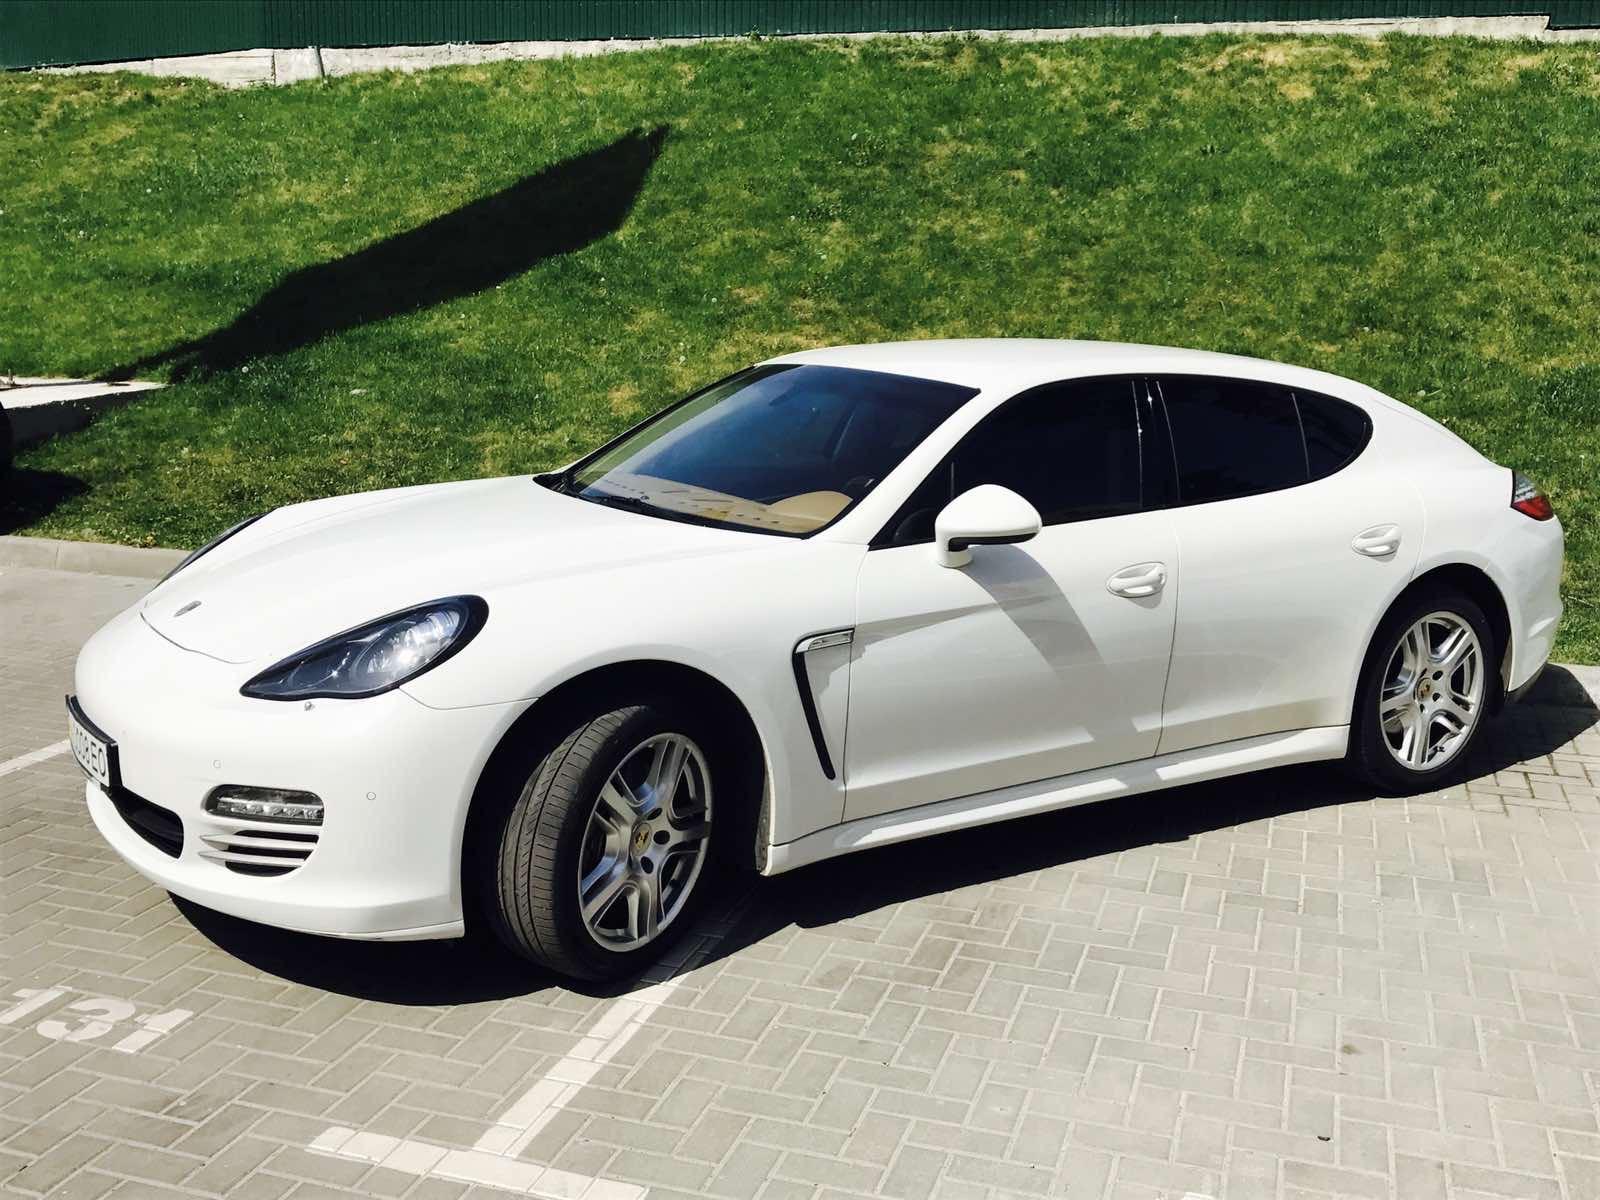 cabriolet, sports car rental in Kiev Porsche Panamera